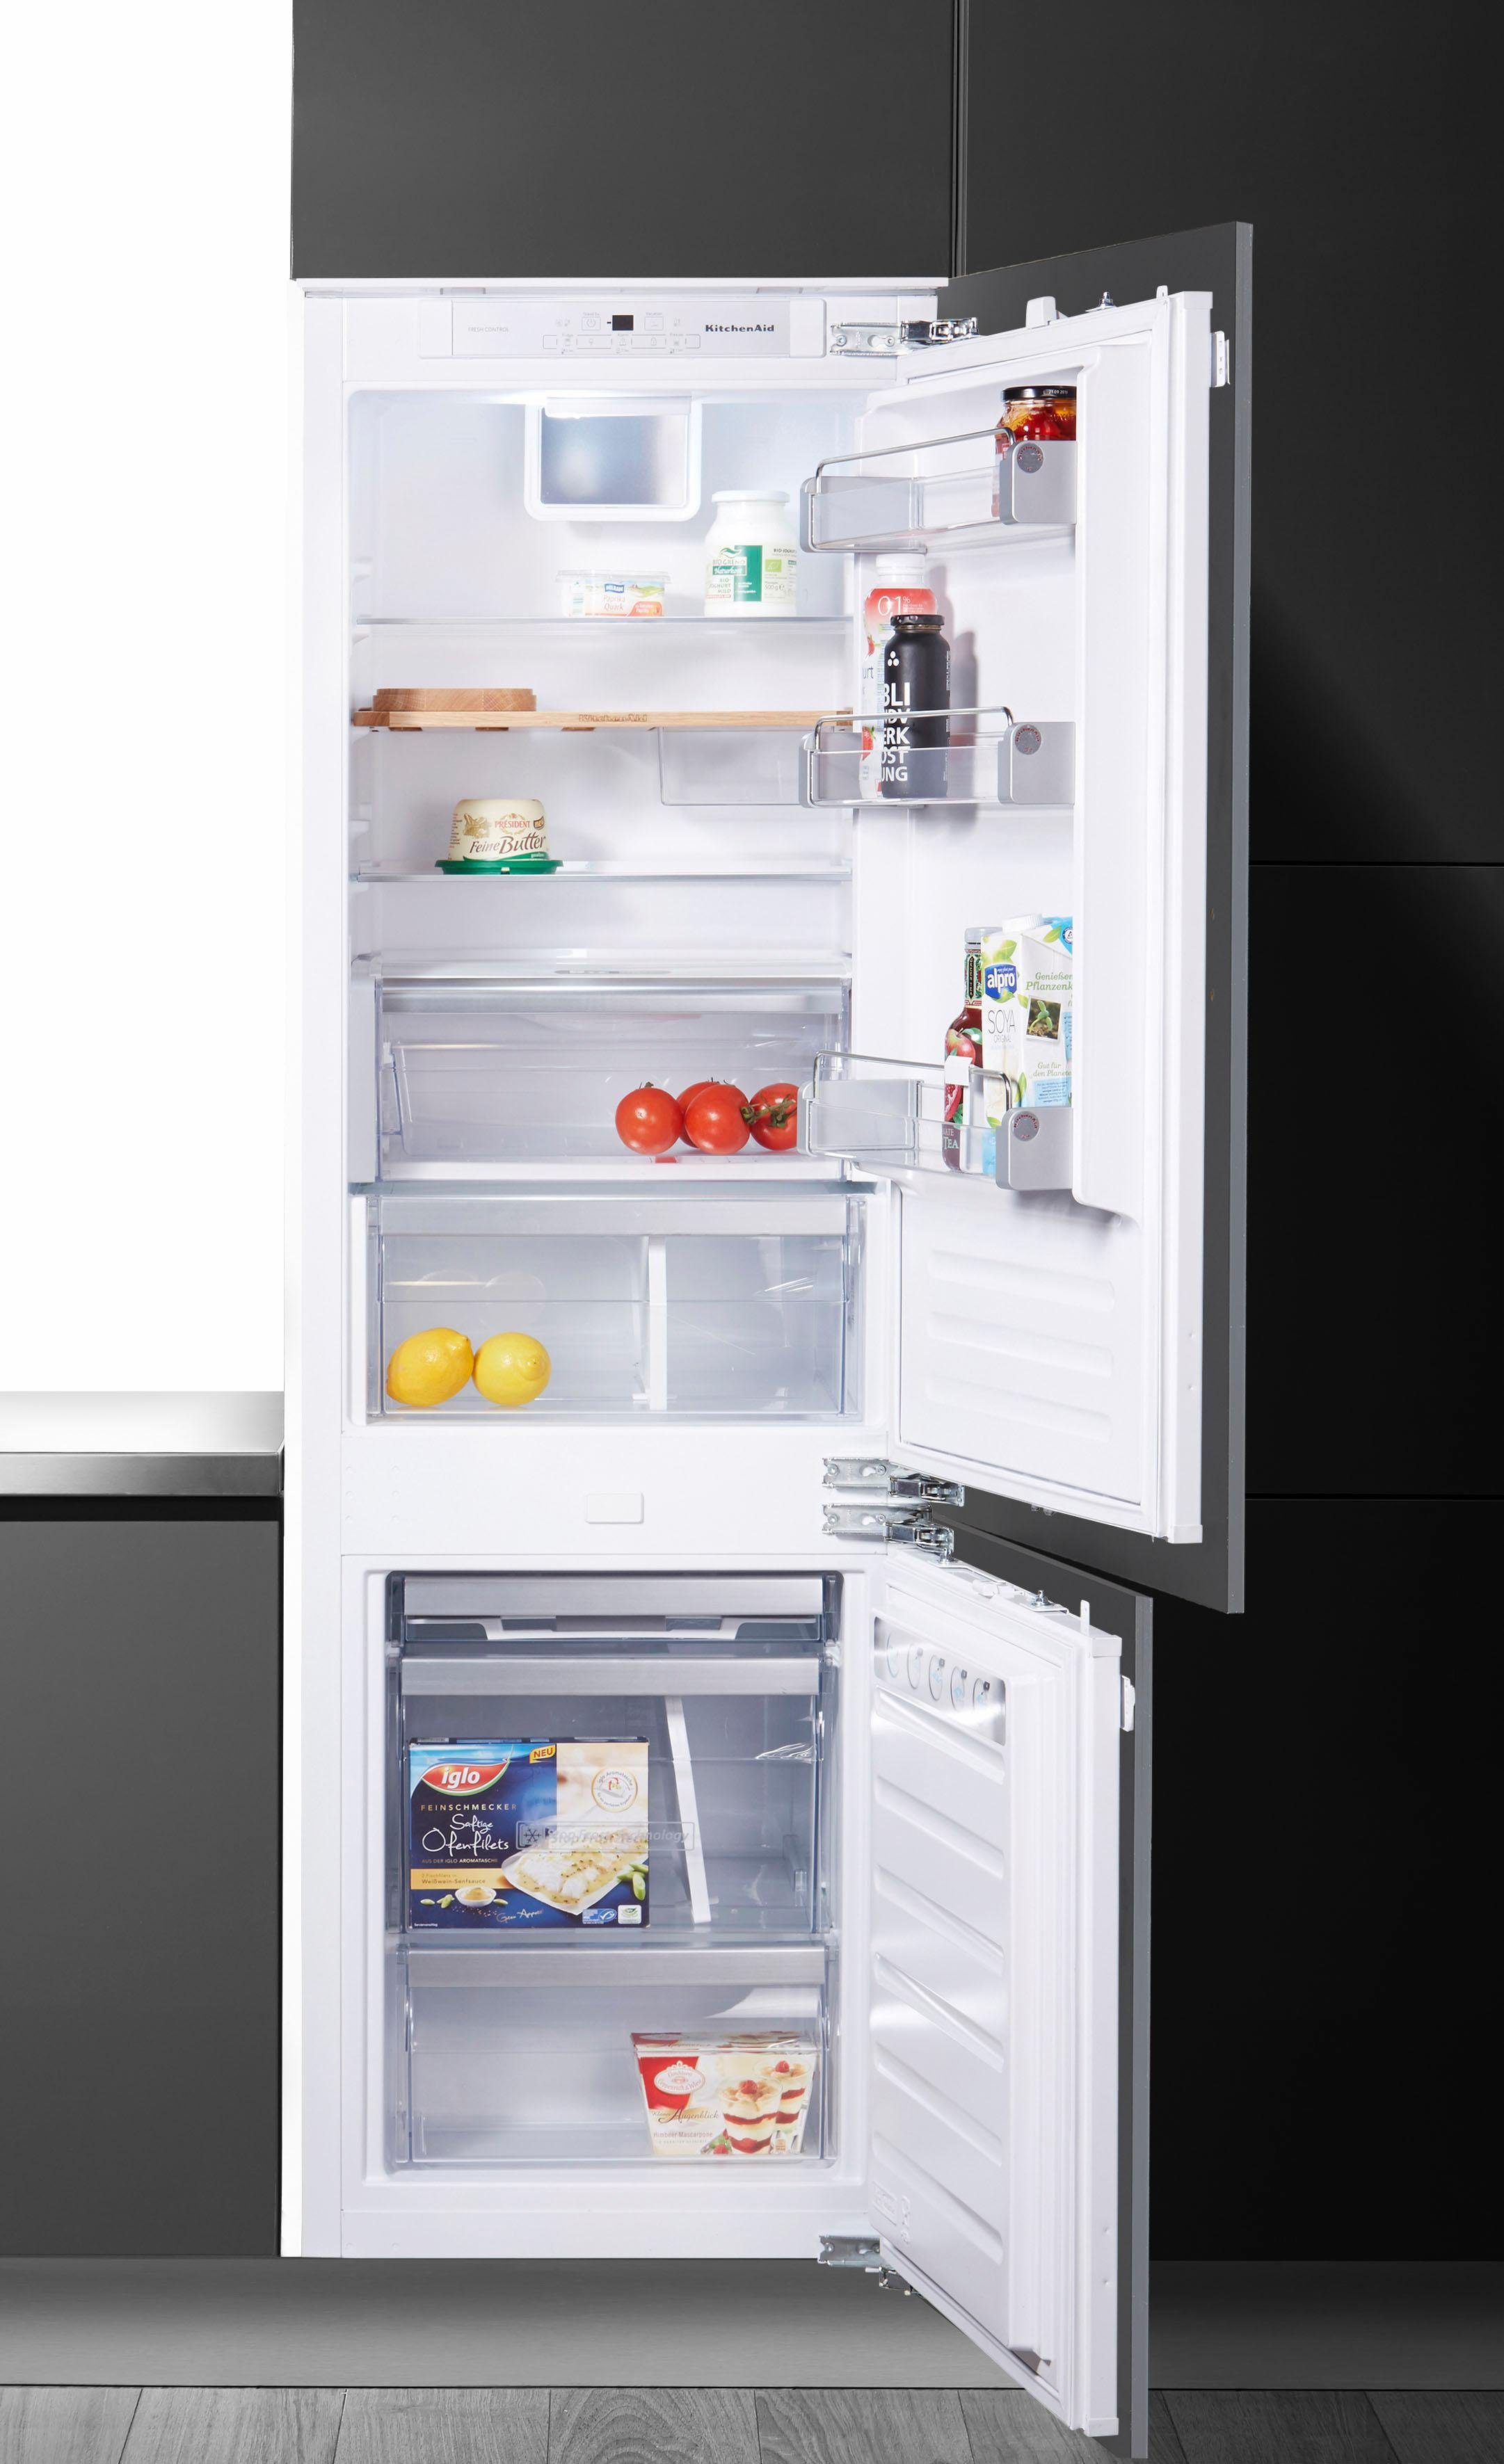 KitchenAid® vollintegrierbare Einbau-Kühlgefrierkombination KCBDS 18601, Energieklasse A++